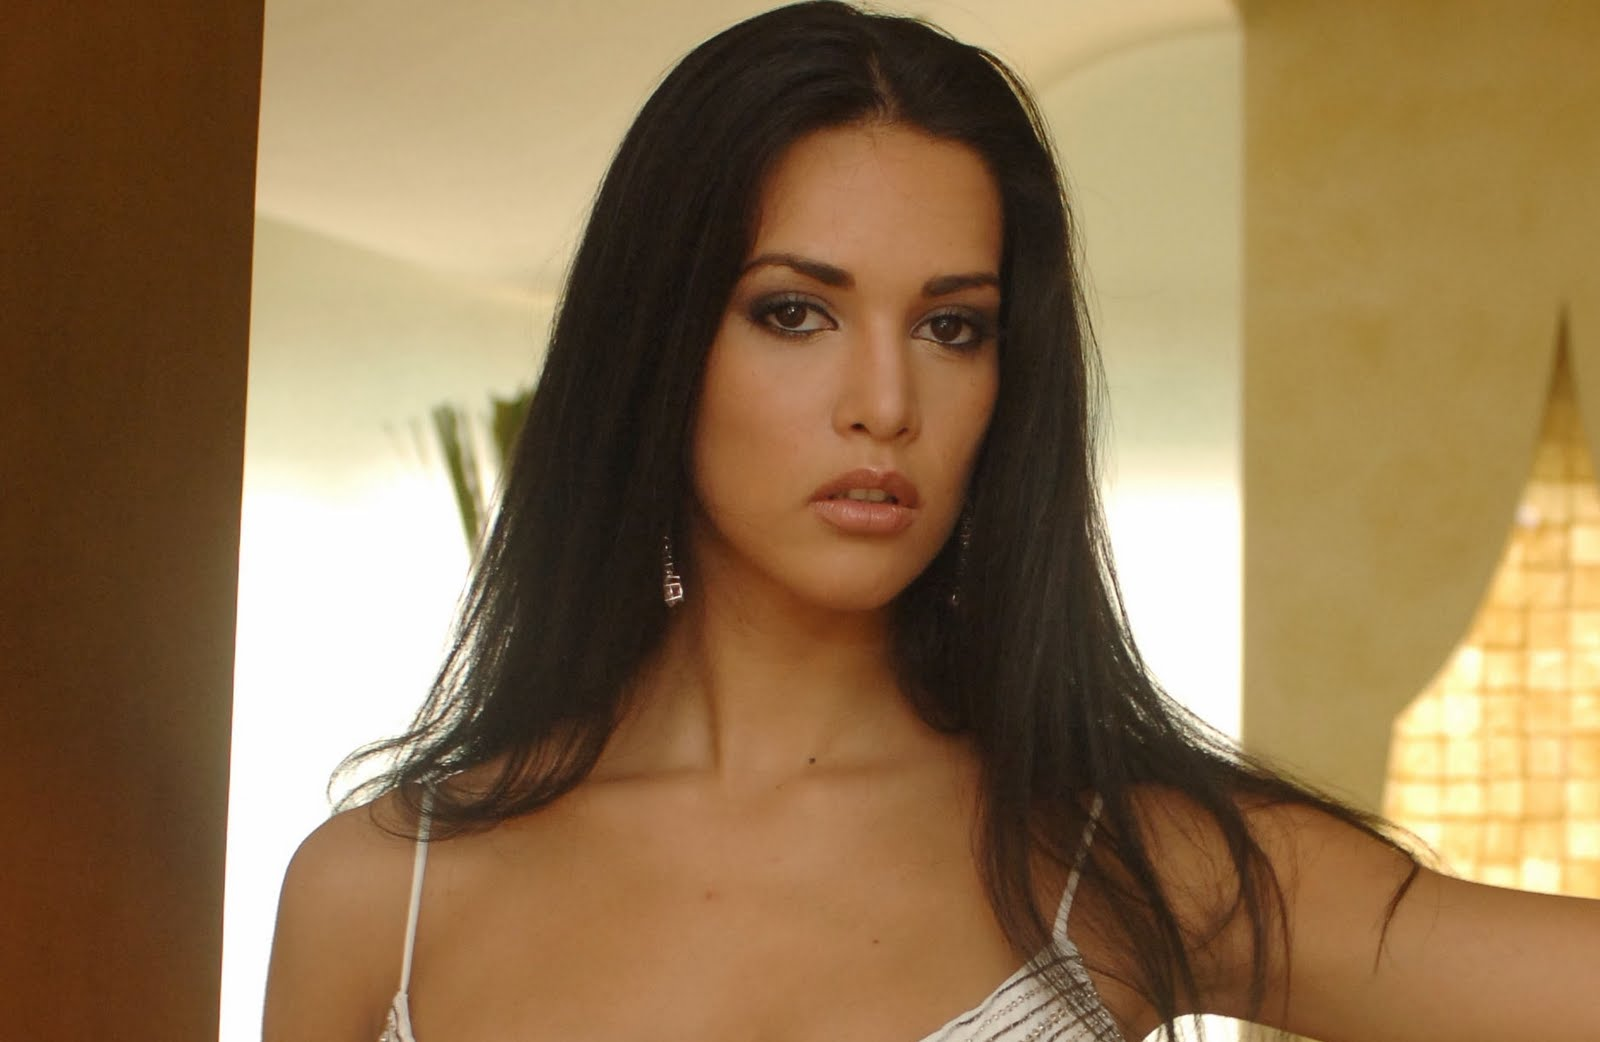 http://2.bp.blogspot.com/_Eozw05WBJ0o/TGzcuYpKs5I/AAAAAAAABTg/7Tj8FhIoMXg/s1600/2005+Mónica+Spear+Mootz.jpg